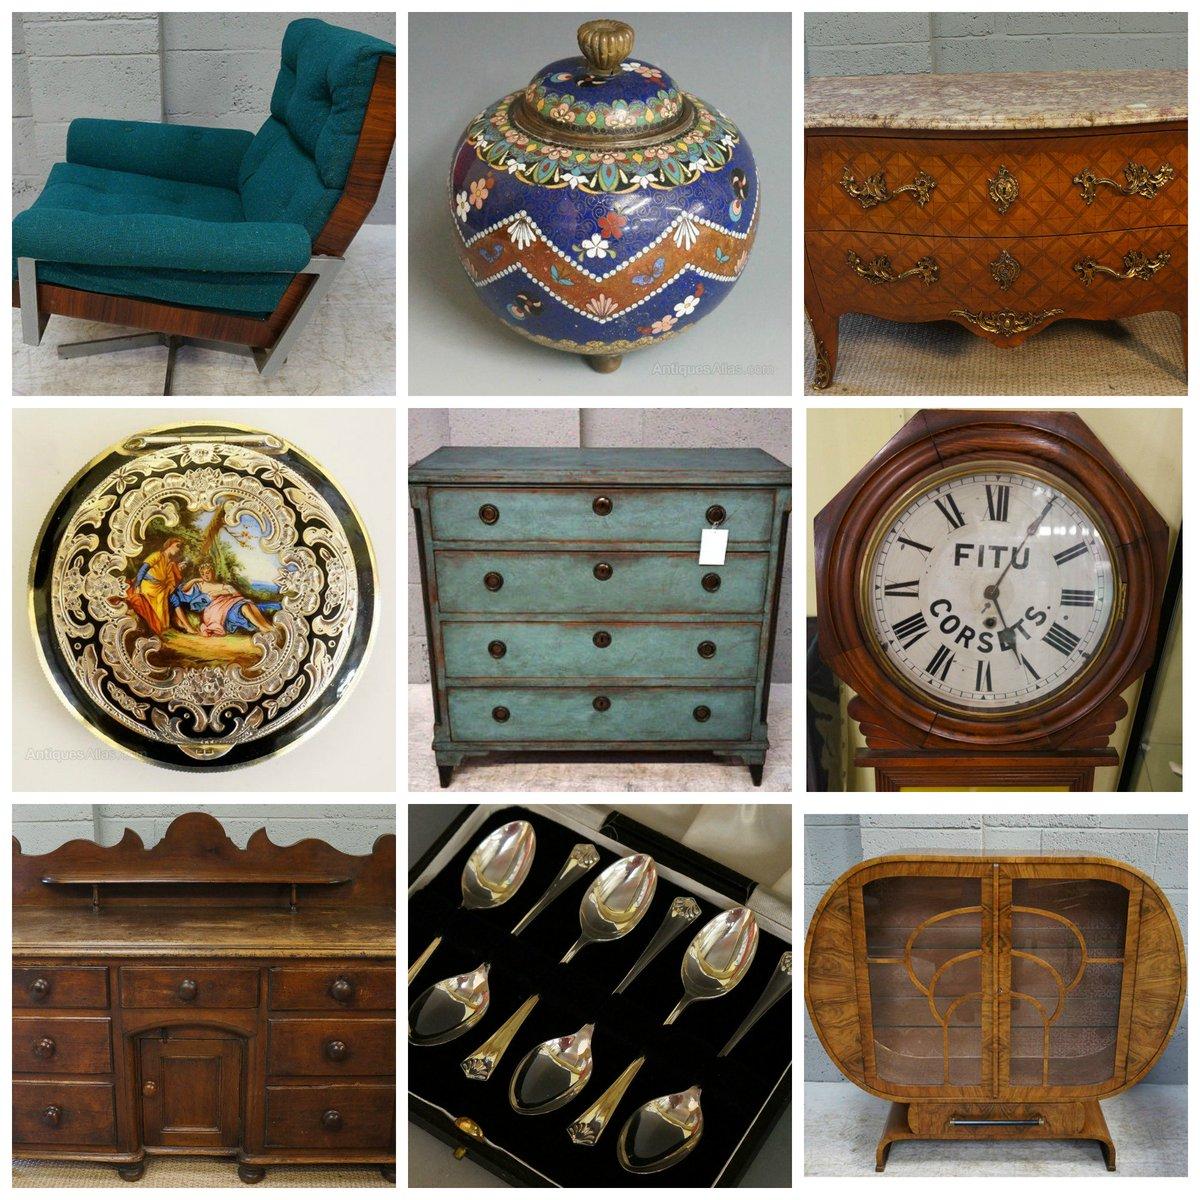 newark antiques newarkantiques twitter. Black Bedroom Furniture Sets. Home Design Ideas